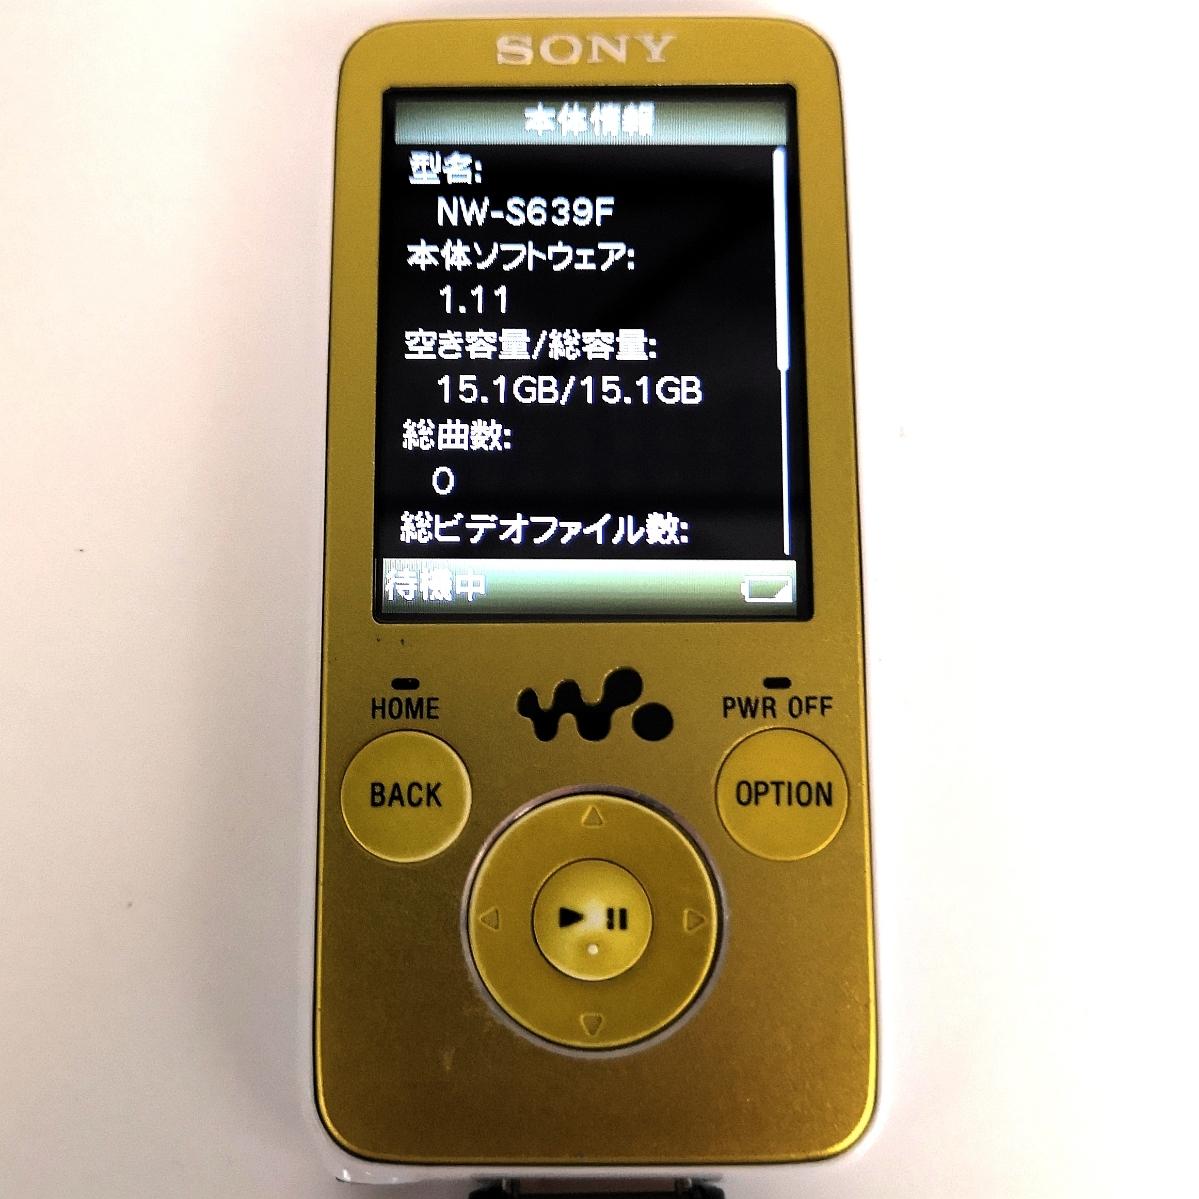 ◆sony nw-s639f◆ 稼働品/ソニー/WALKMAN/ウォークマン/ポータブルオーディオプレーヤー/オーディオ機器/レトロ/音楽プレイヤー/CE0